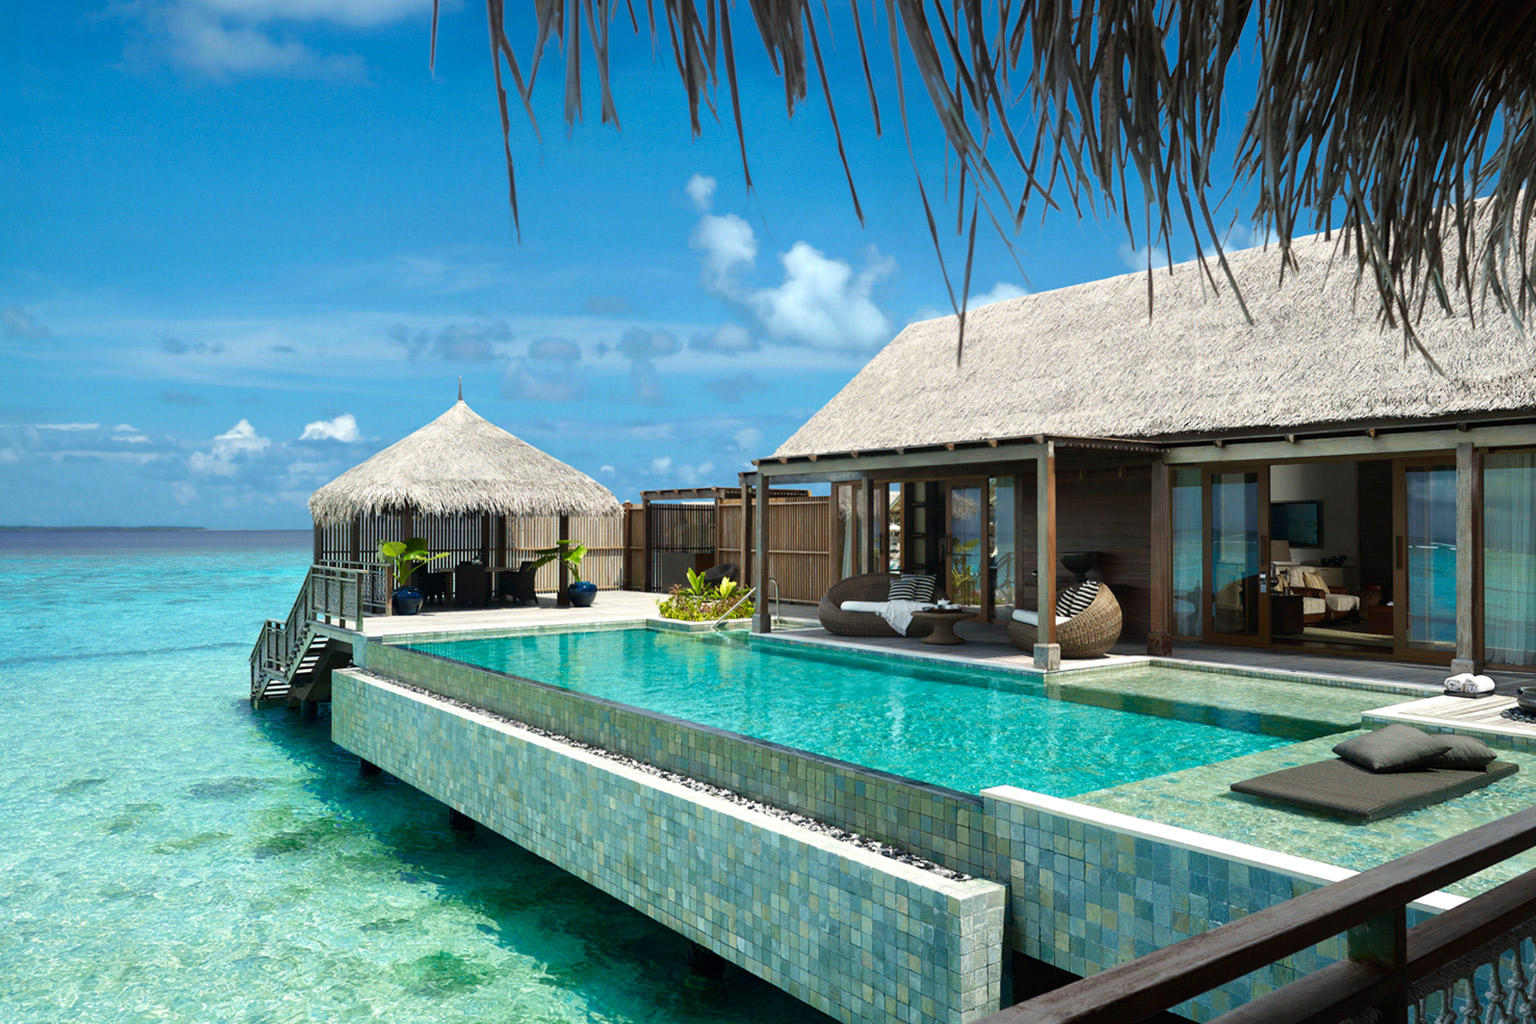 shangri la 39 s villingili resort designreisen. Black Bedroom Furniture Sets. Home Design Ideas